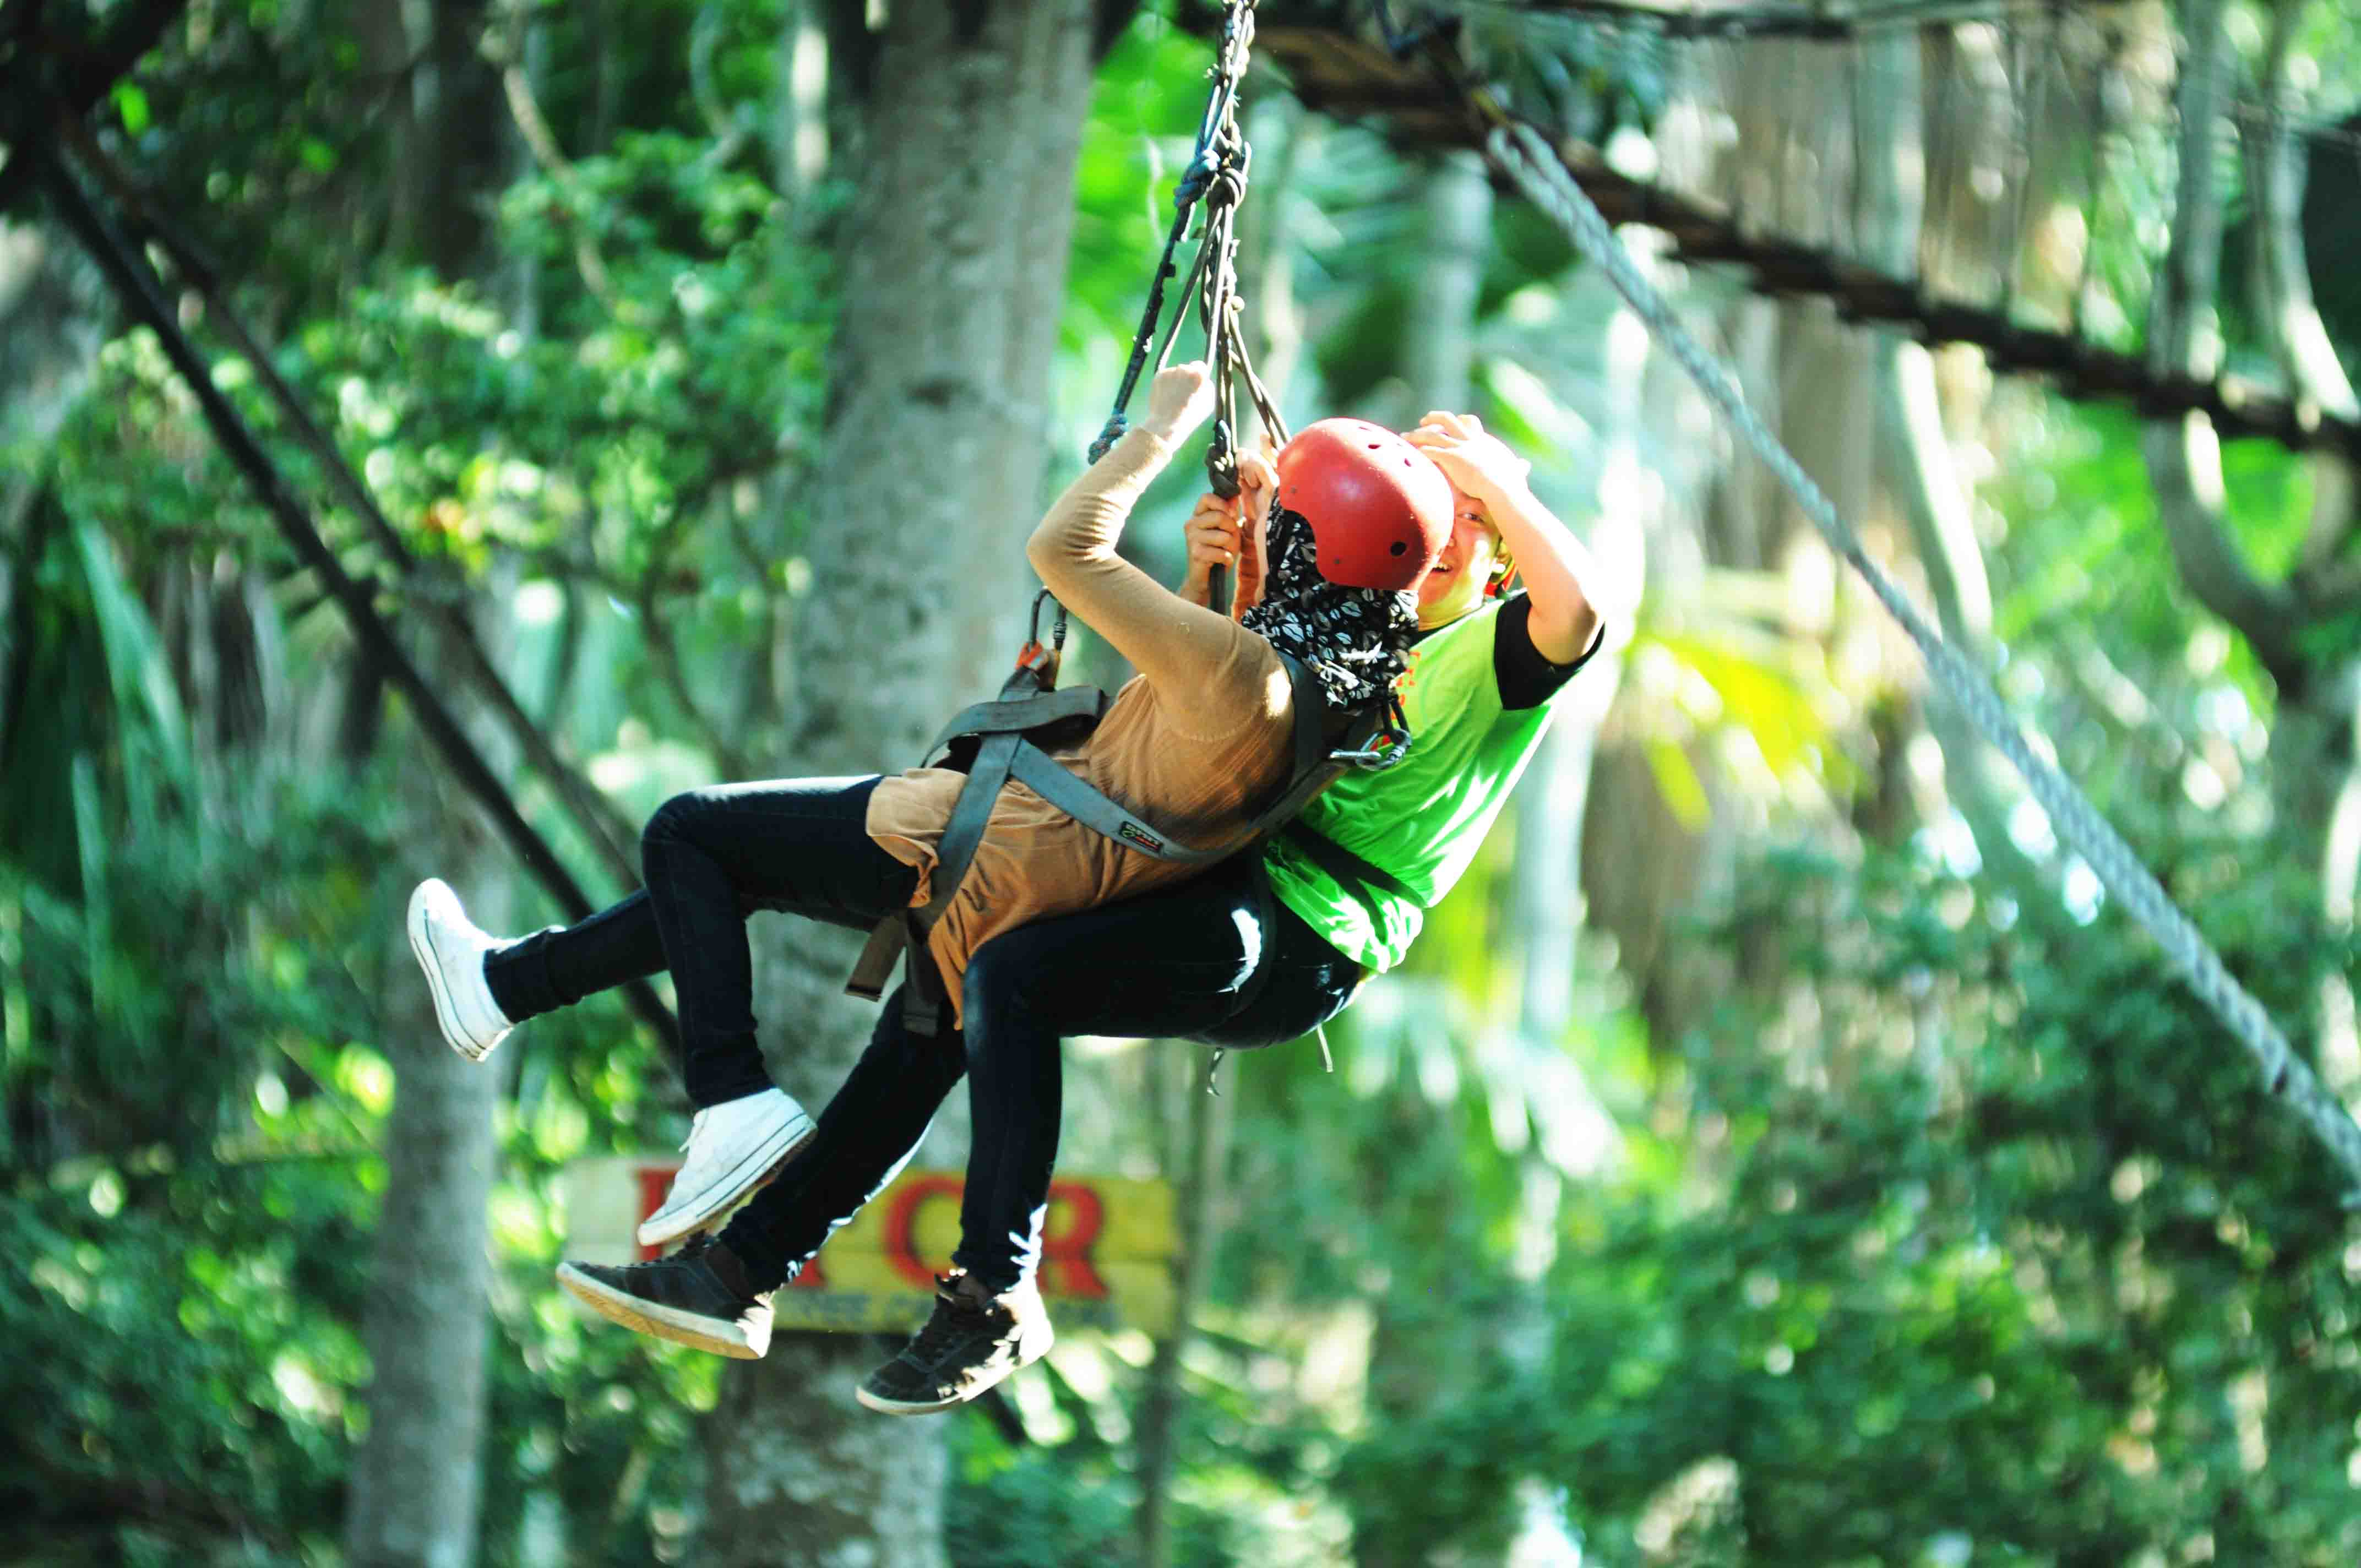 Kemudahan Berbelanja Kayu Terbaik Potp Tanjung Papuma Tretes Treetop Adventure